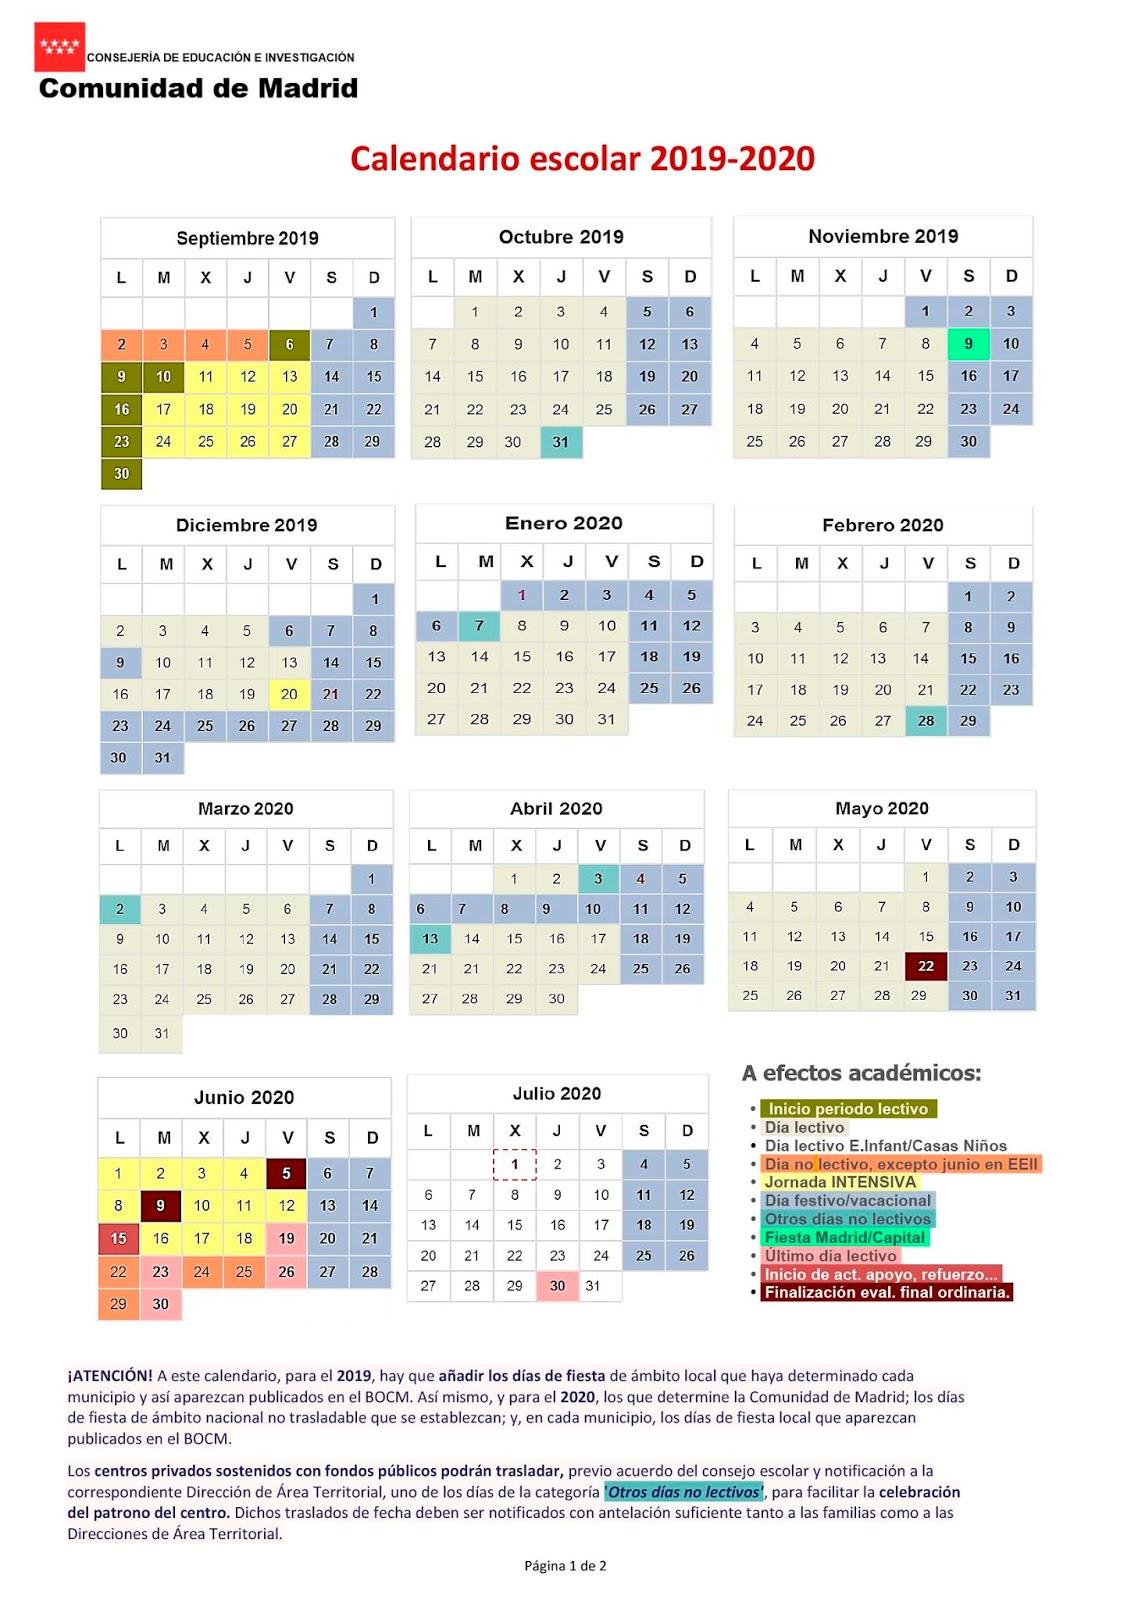 Calendario Escolar Galicia 2020 Y 2019.Mareaverde Calendario Escolar 2019 2020